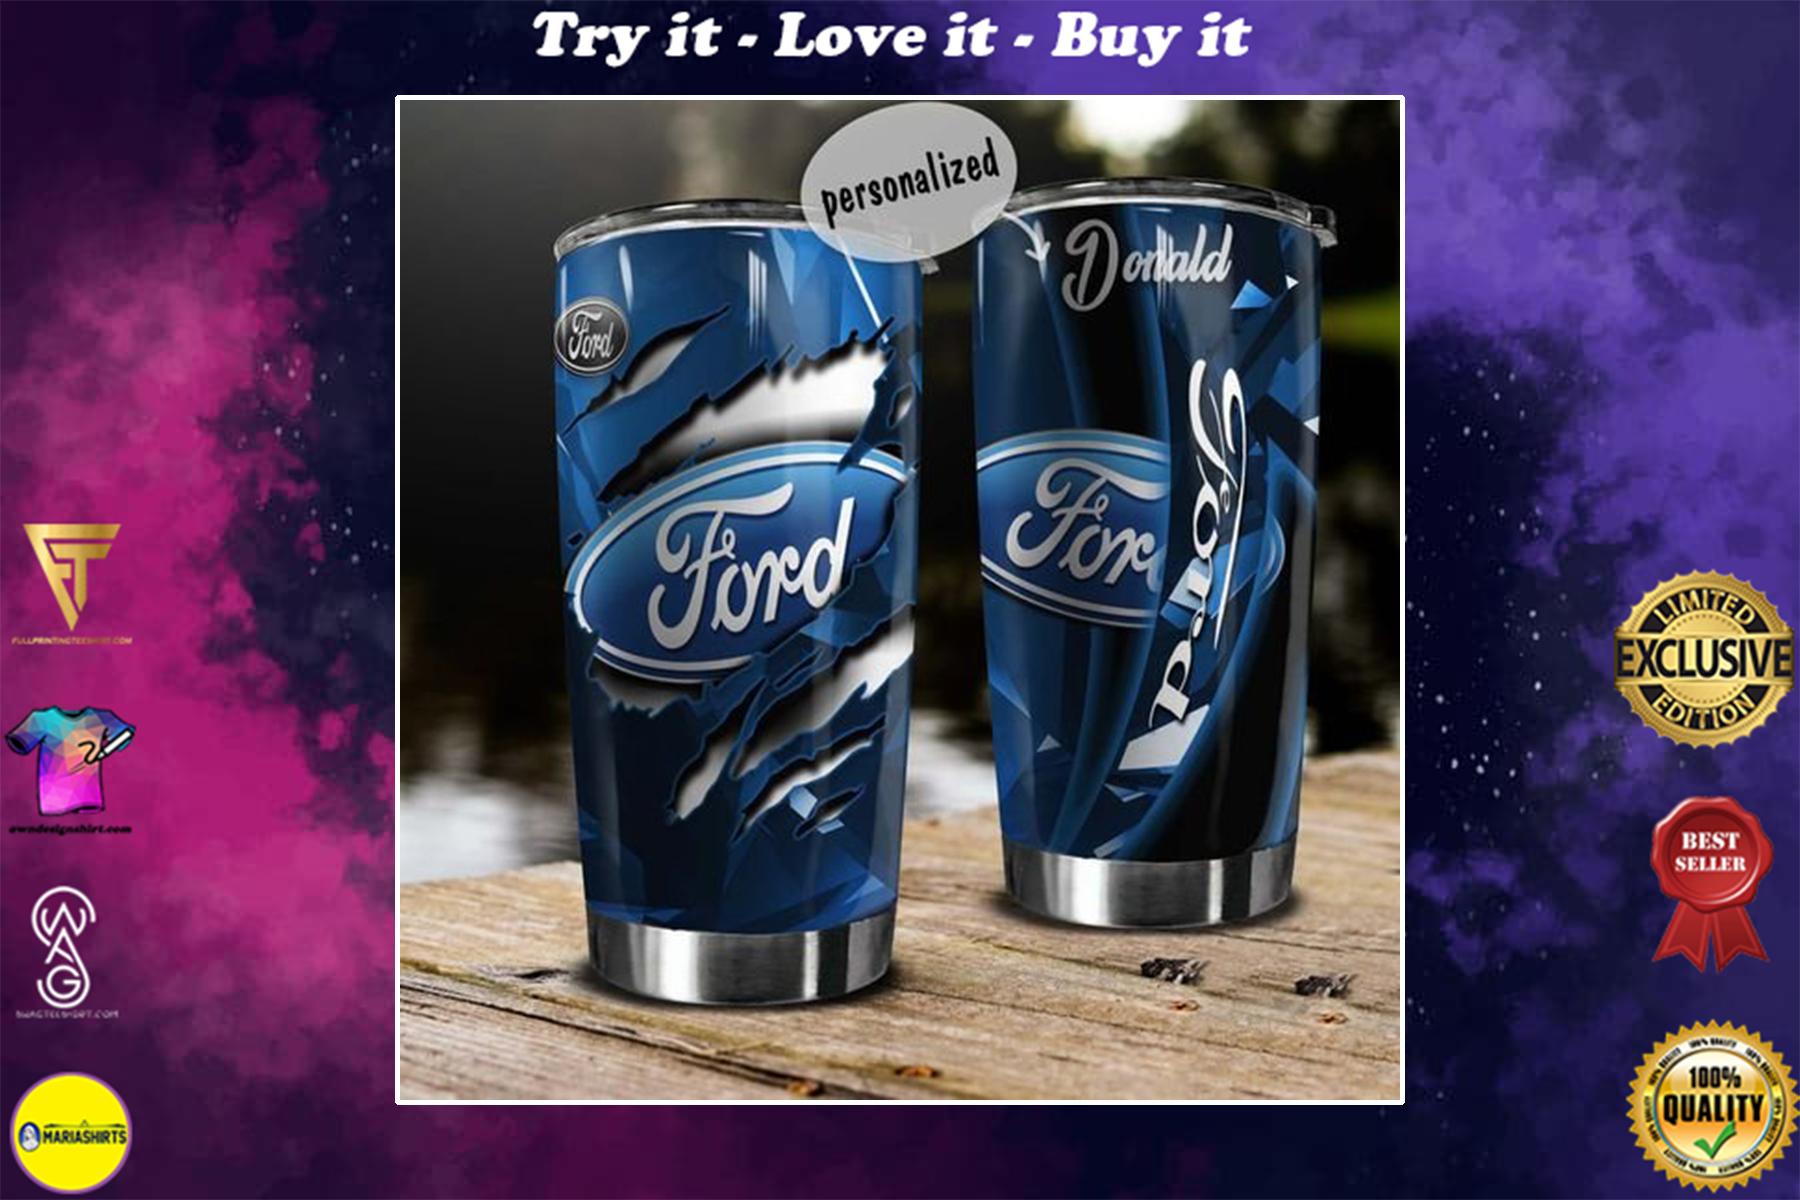 [special edition] custom name ford motor symbol tumbler - maria